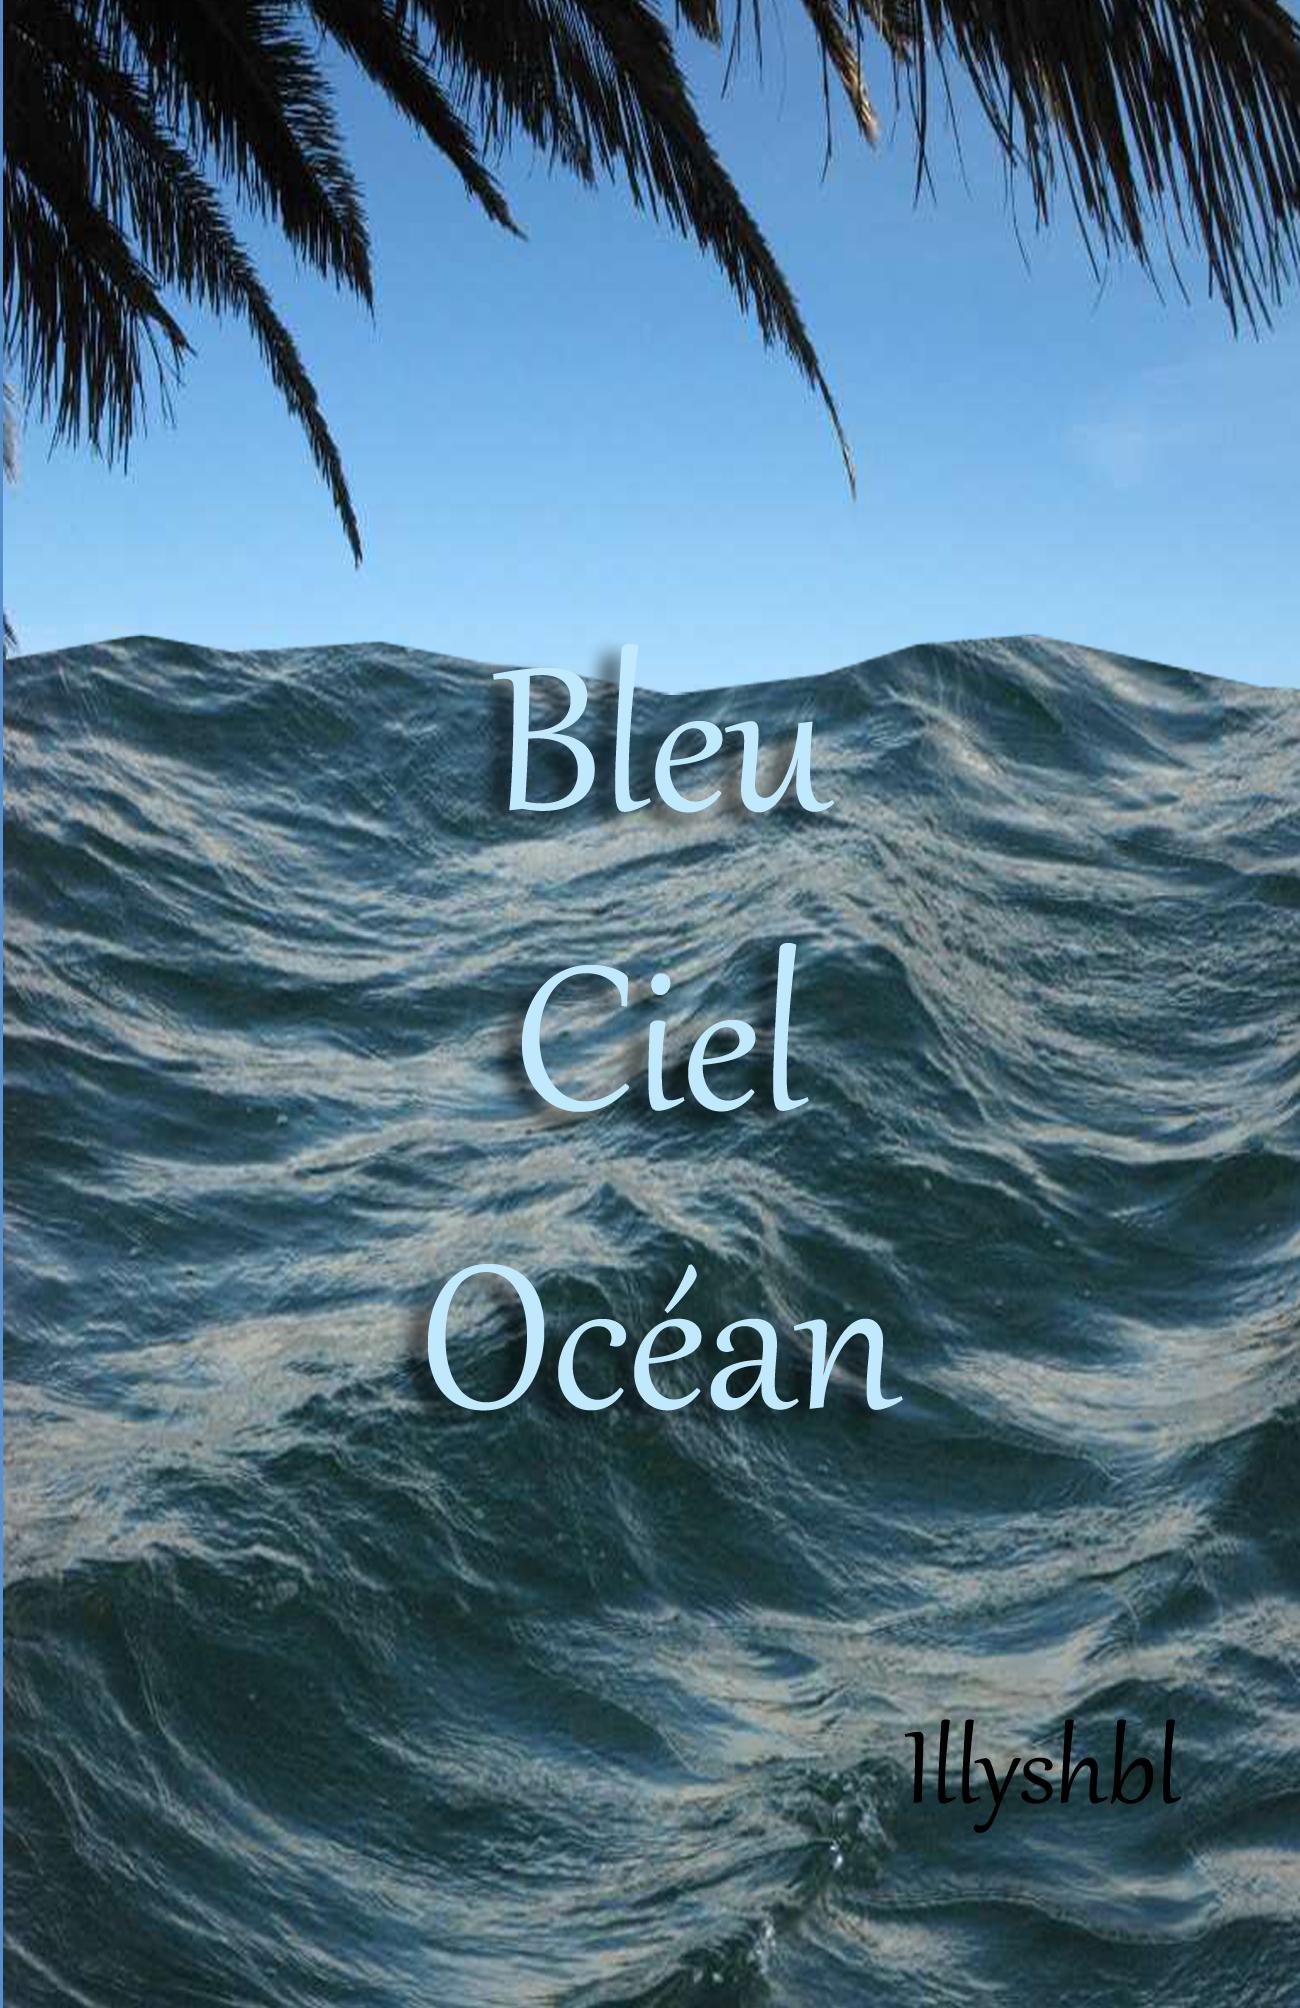 Bleu Ciel Océan